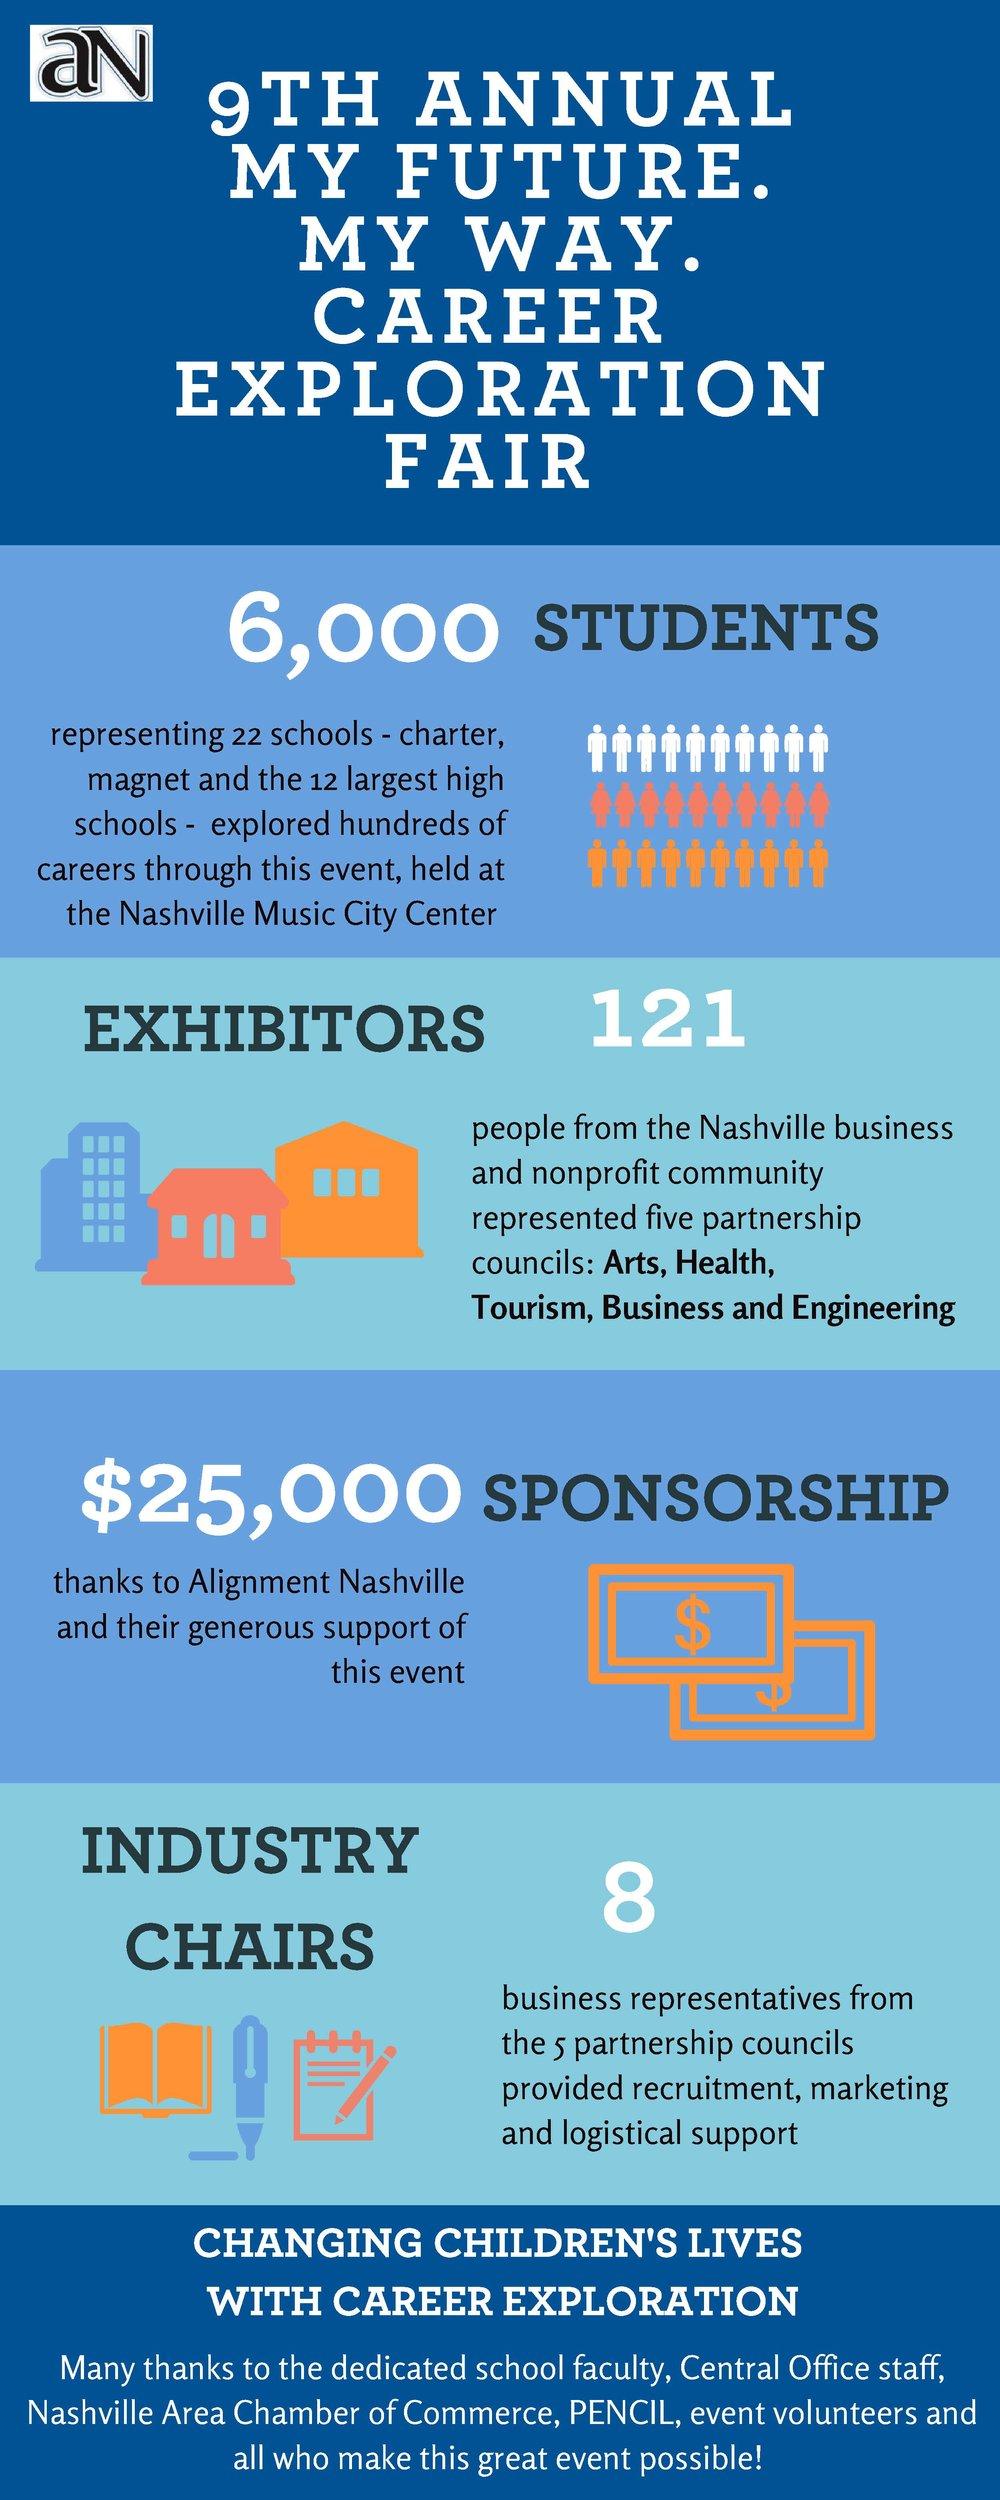 Career-Exploration-Fair-Infographic.jpg